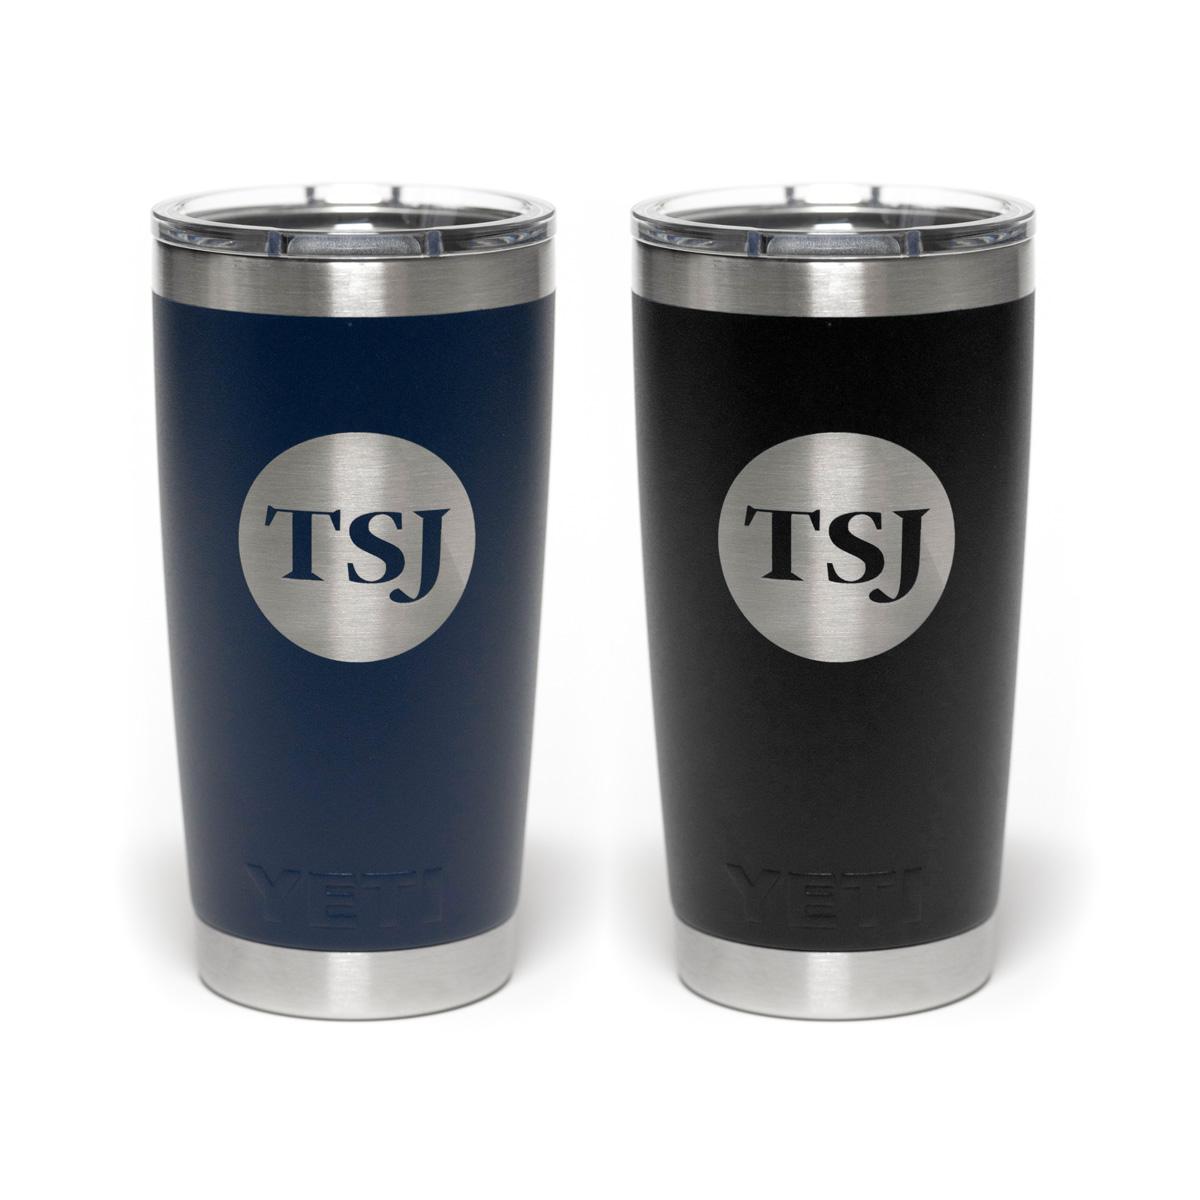 TSJ Yeti Rambler Cup | Navy Blue & Black